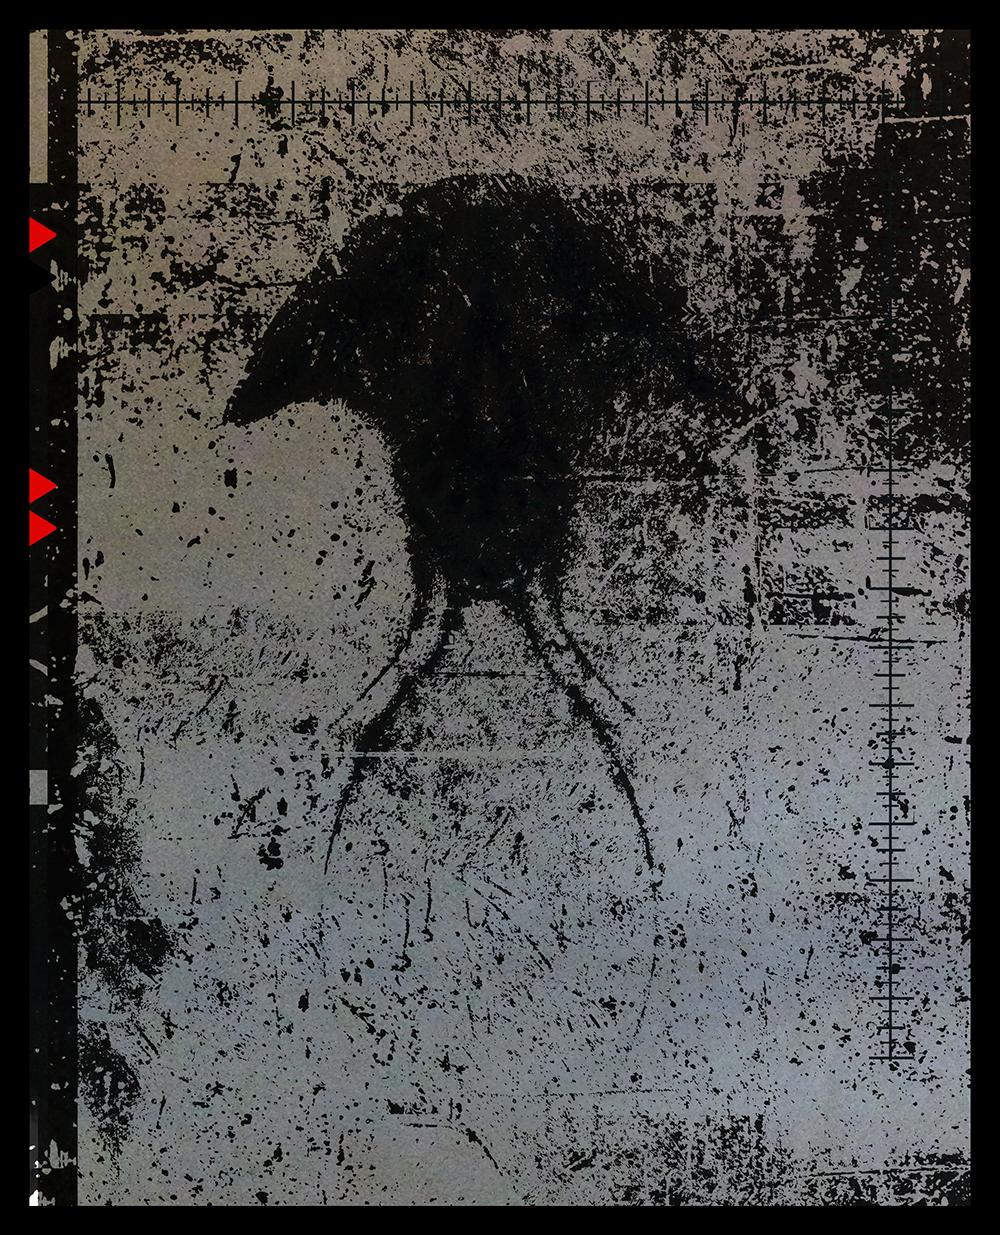 CRINI-silhouettes-9.png